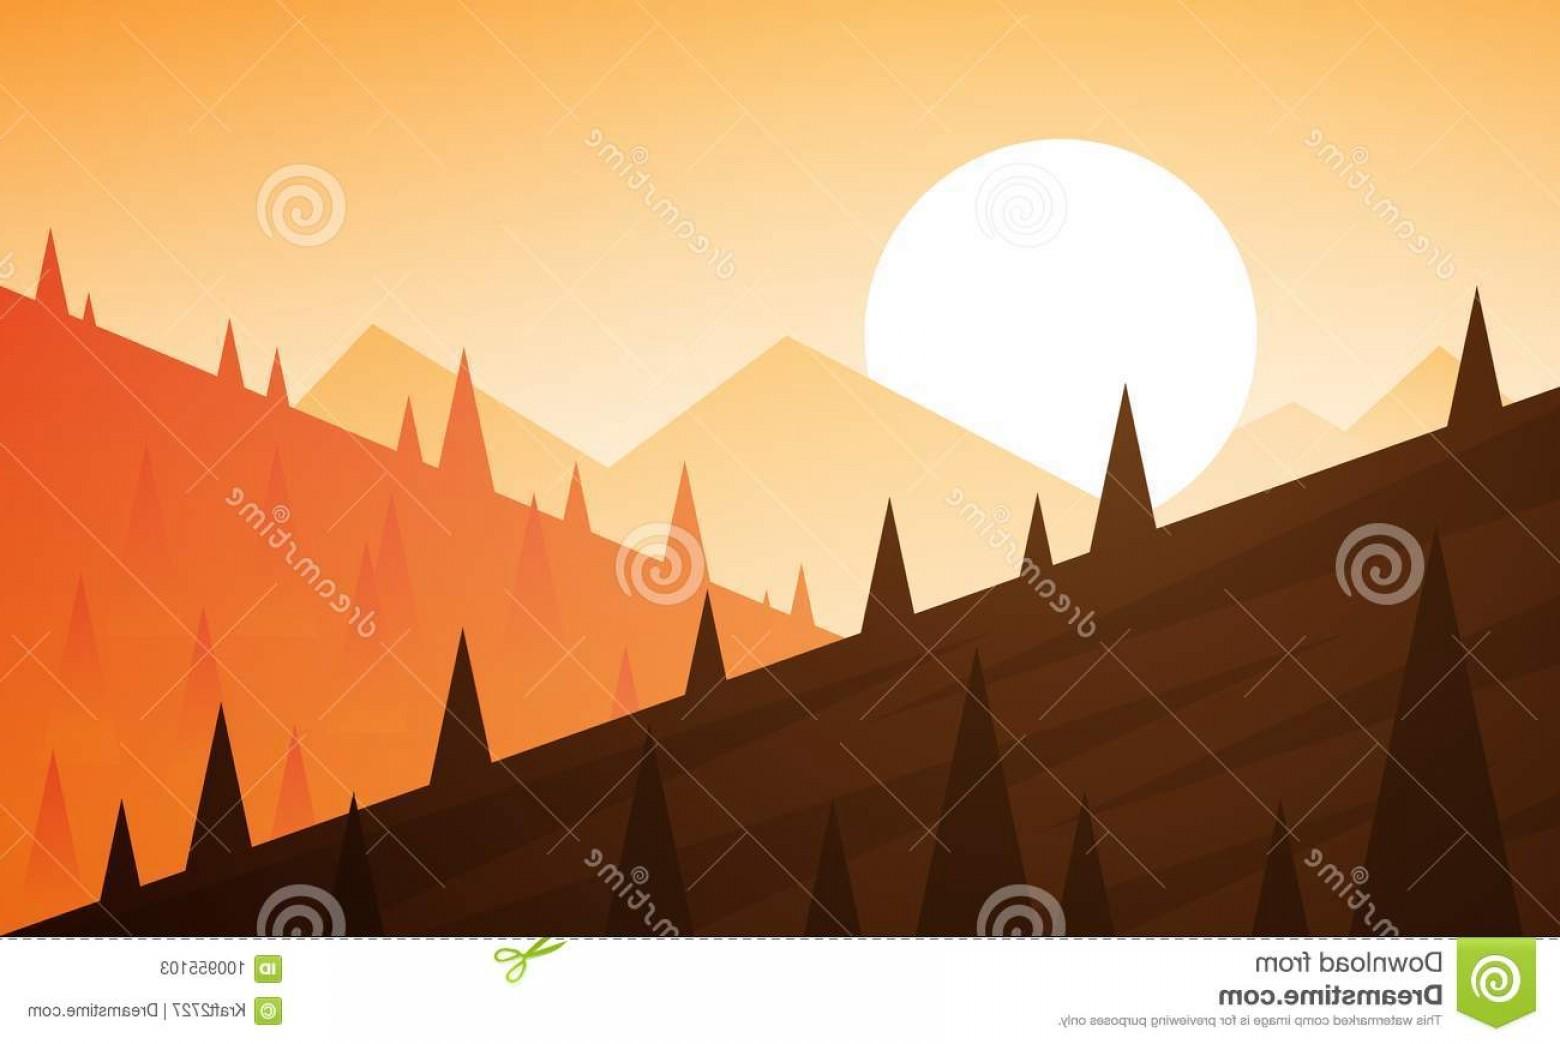 1560x1044 Landscape Graphic Mountains Sunset Landscape Graphic Mountain